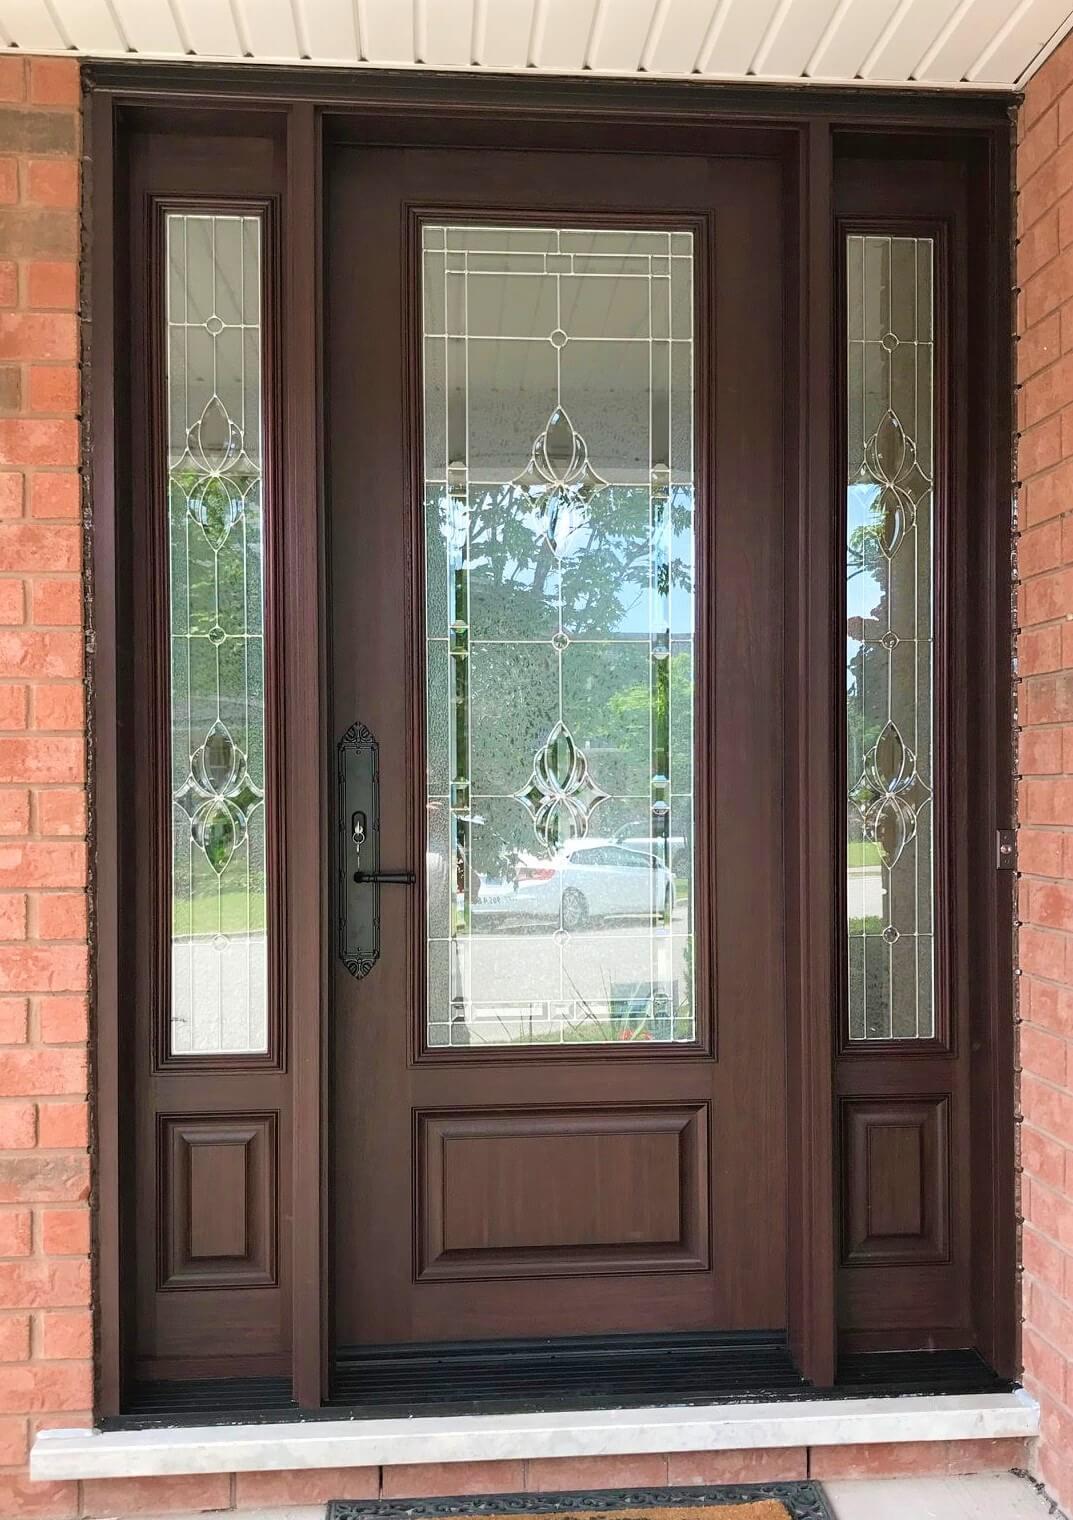 Sedona Red Stain 8 Fiber Glass Door System 1 Oakville Windows And